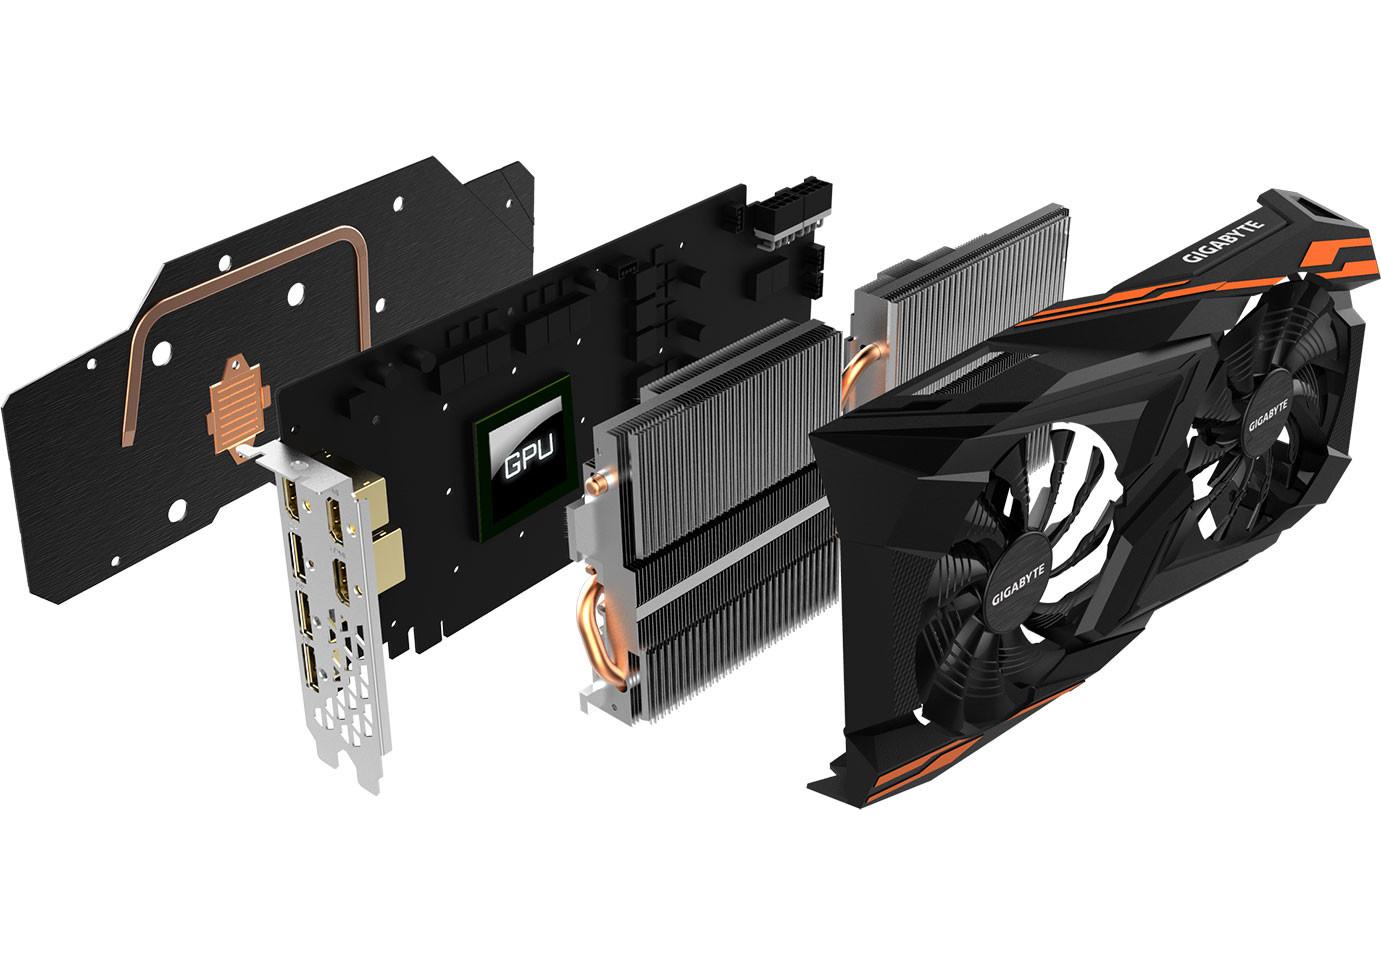 GIGABYTE Radeon RX Vega